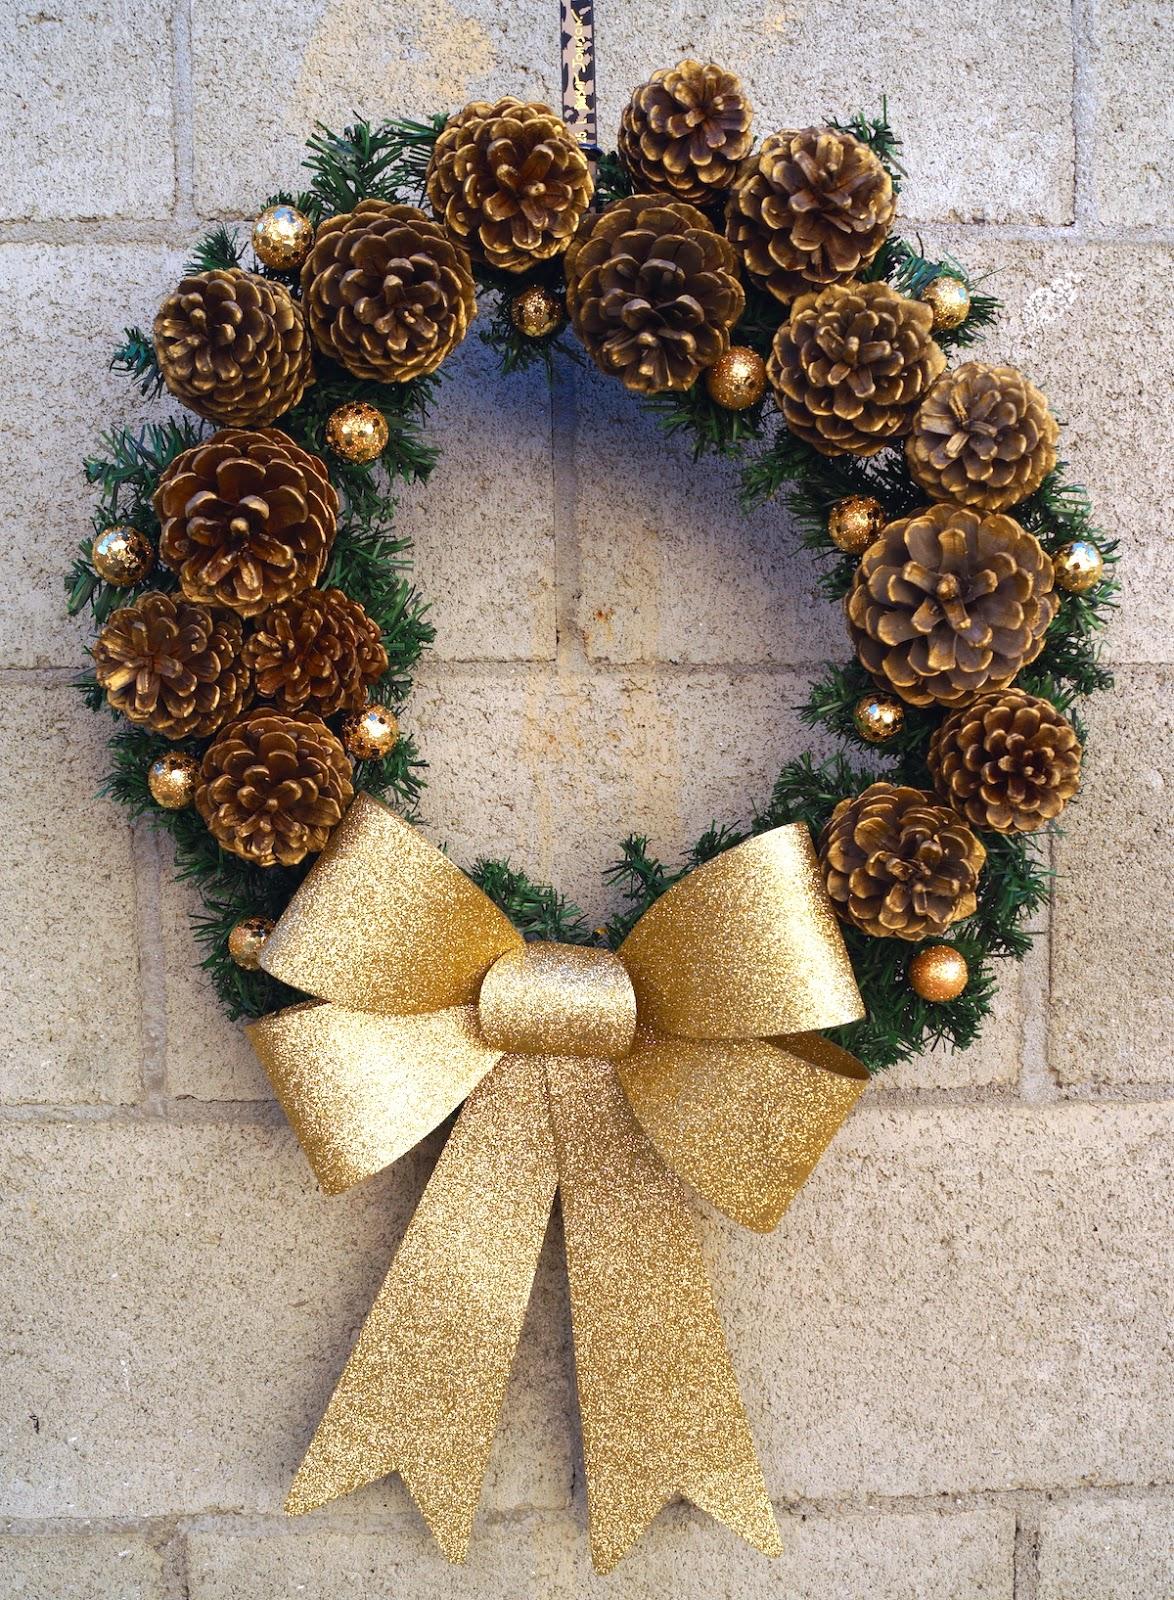 Corona navide a de pi as pinos conos diy mi cocina - Manualidades navidad con pinas ...